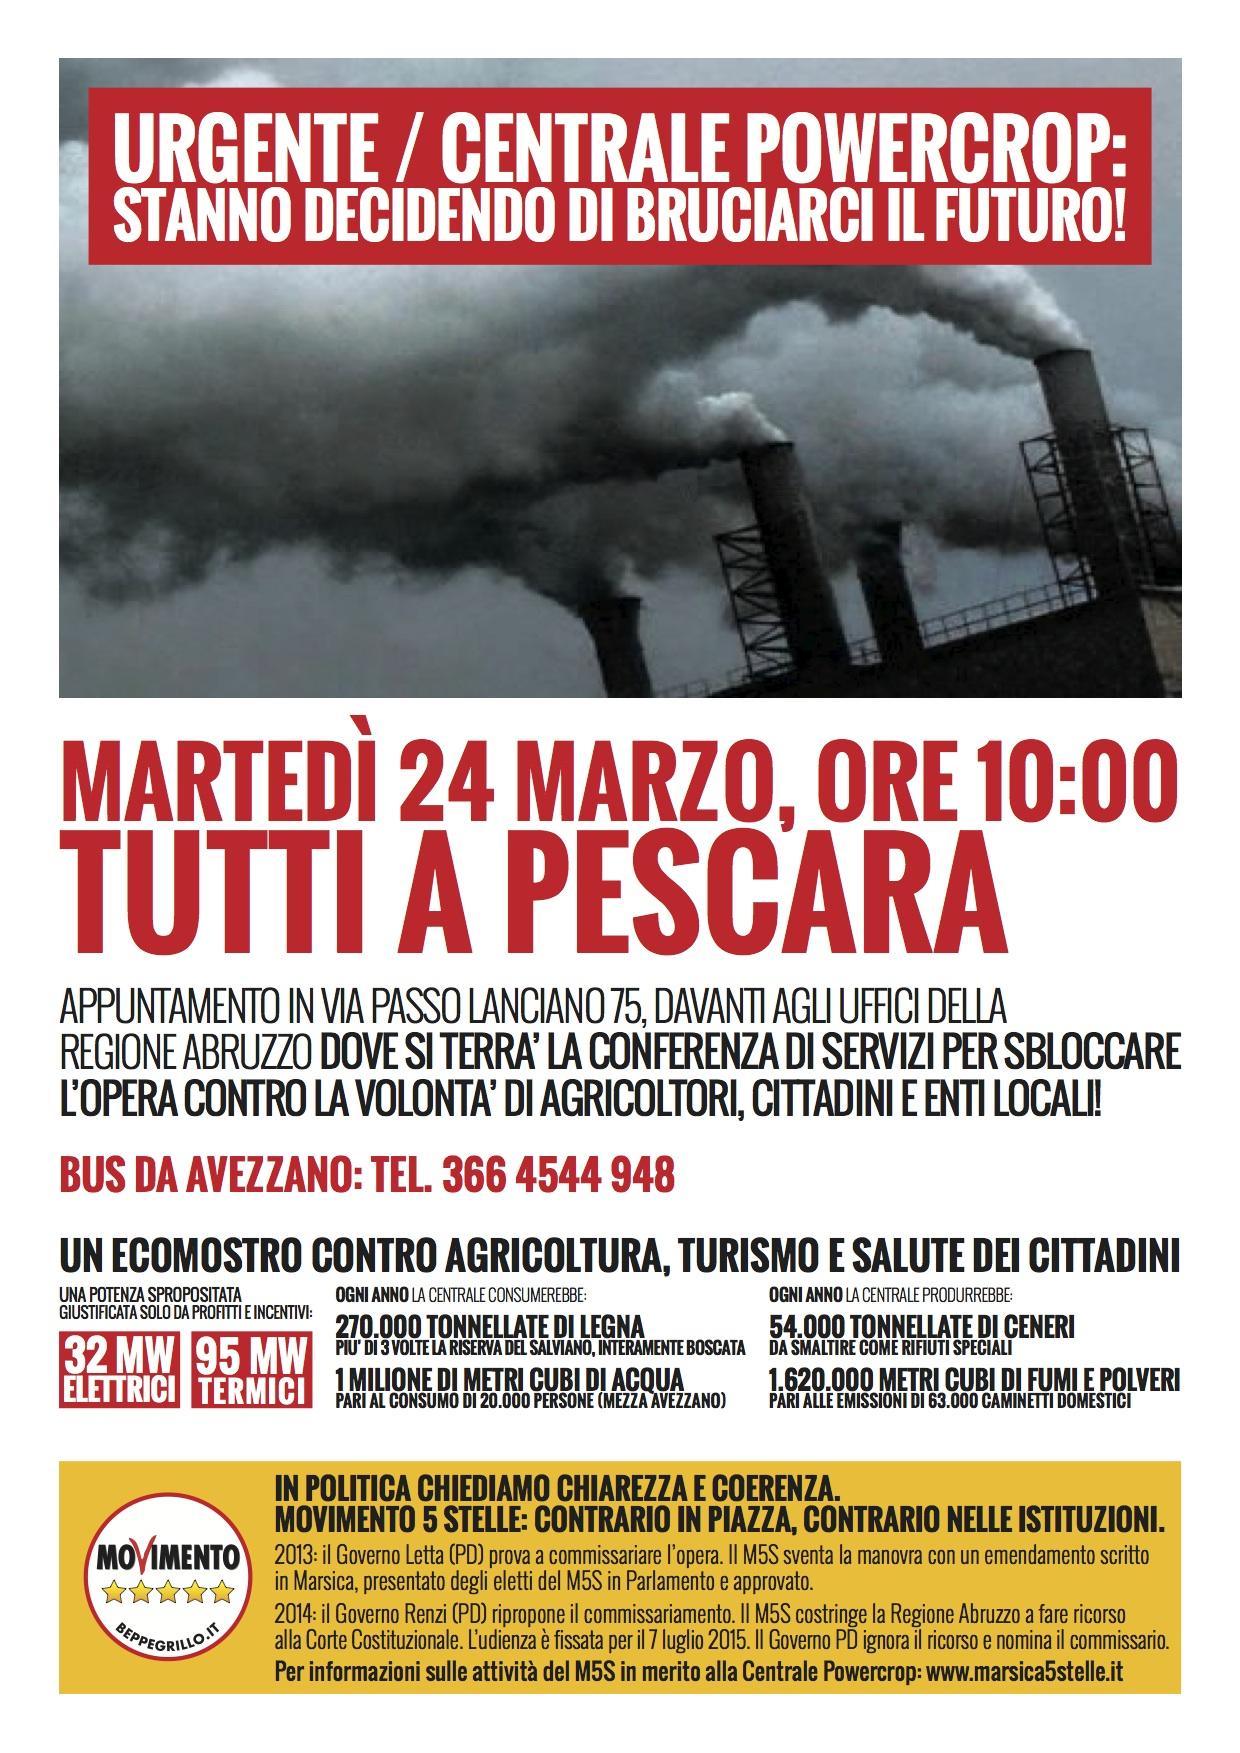 M5S_avezzano_Powercrop_Pescara_locandina